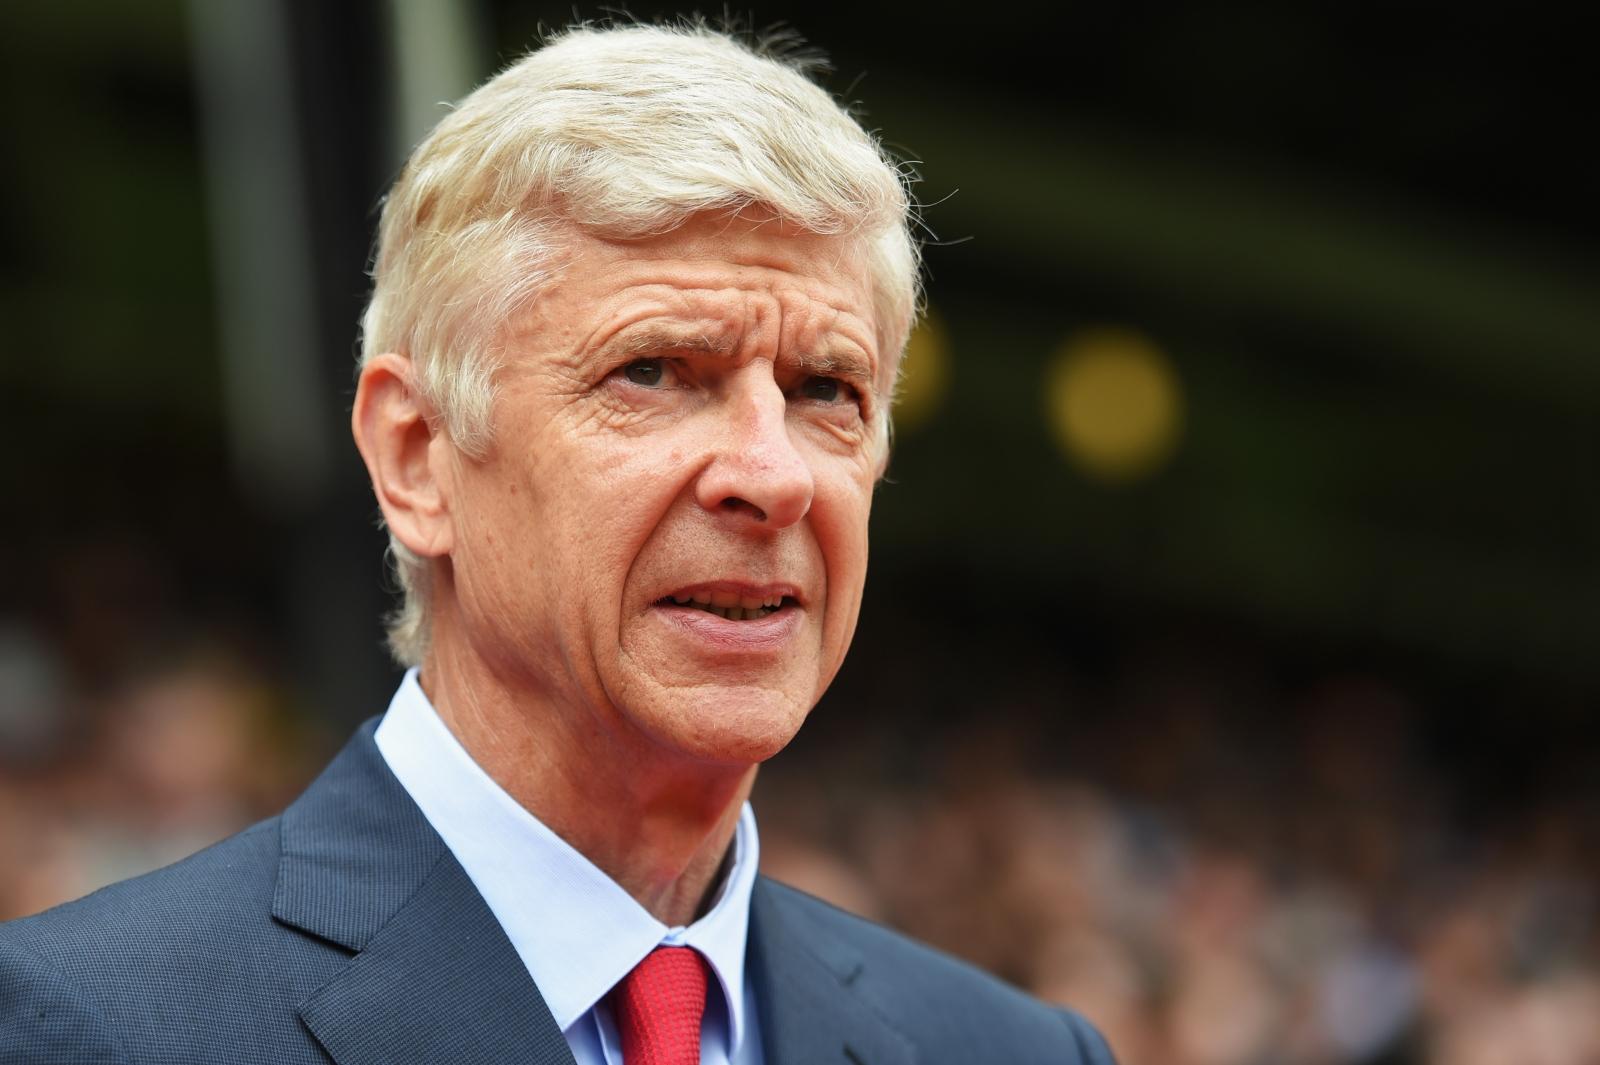 Arsène Wenger headshot